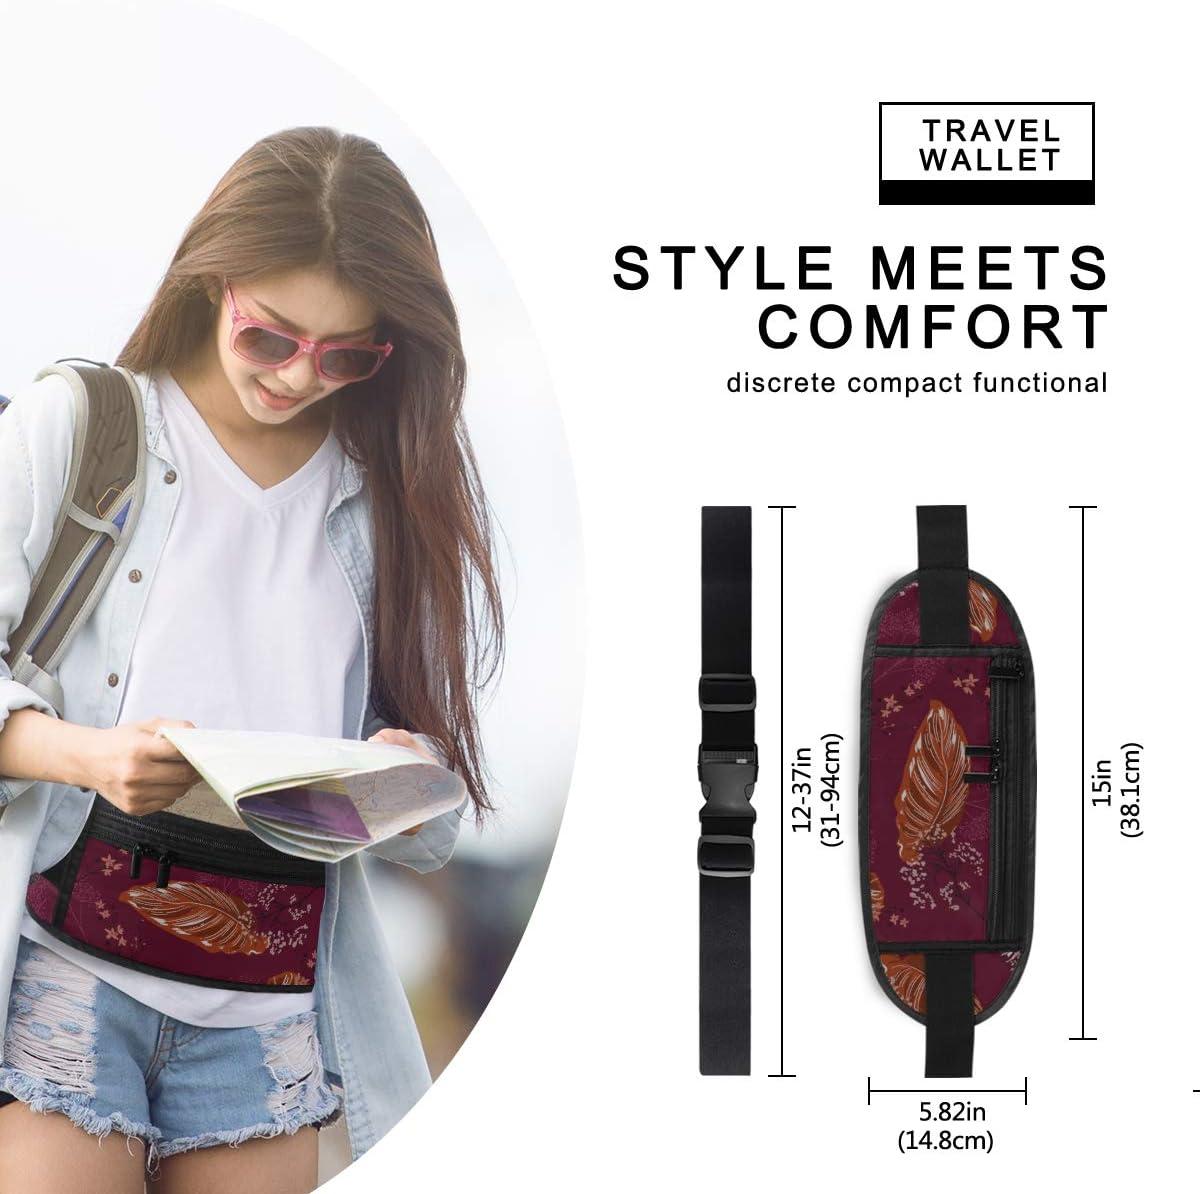 Travel Waist Pack,travel Pocket With Adjustable Belt Beautiful Wallpaper Leaf Running Lumbar Pack For Travel Outdoor Sports Walking